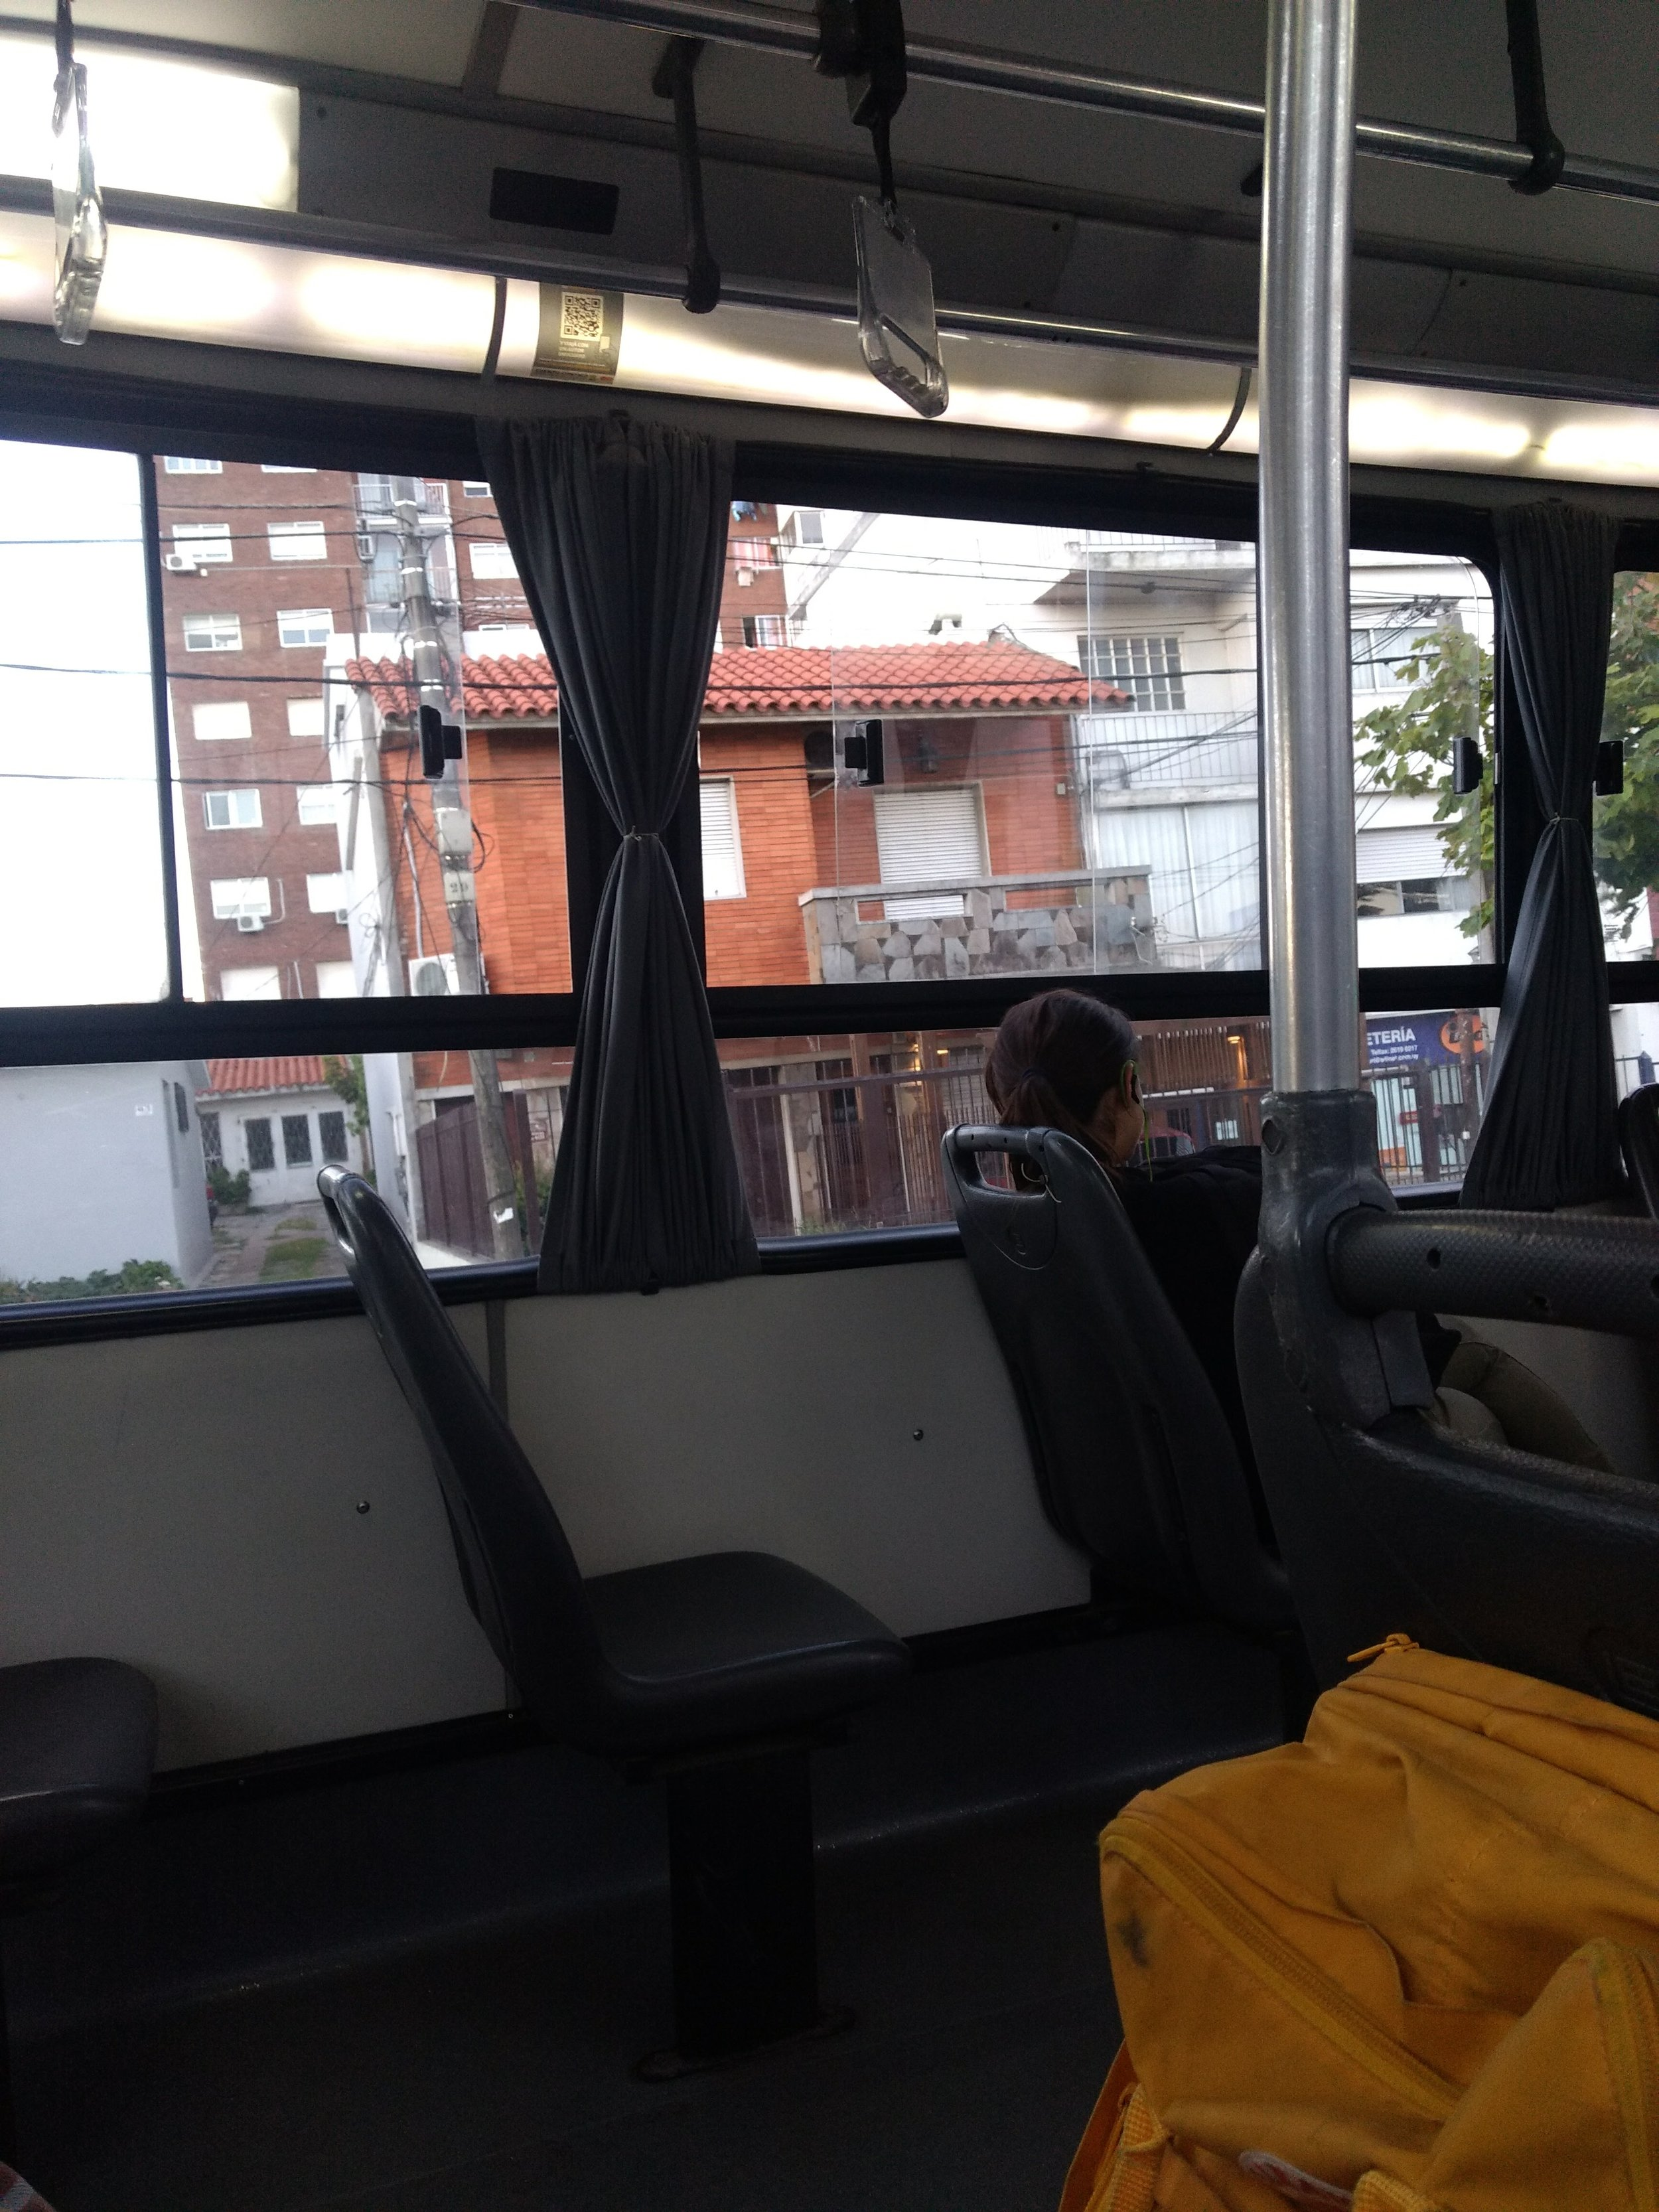 BusInterior.jpg